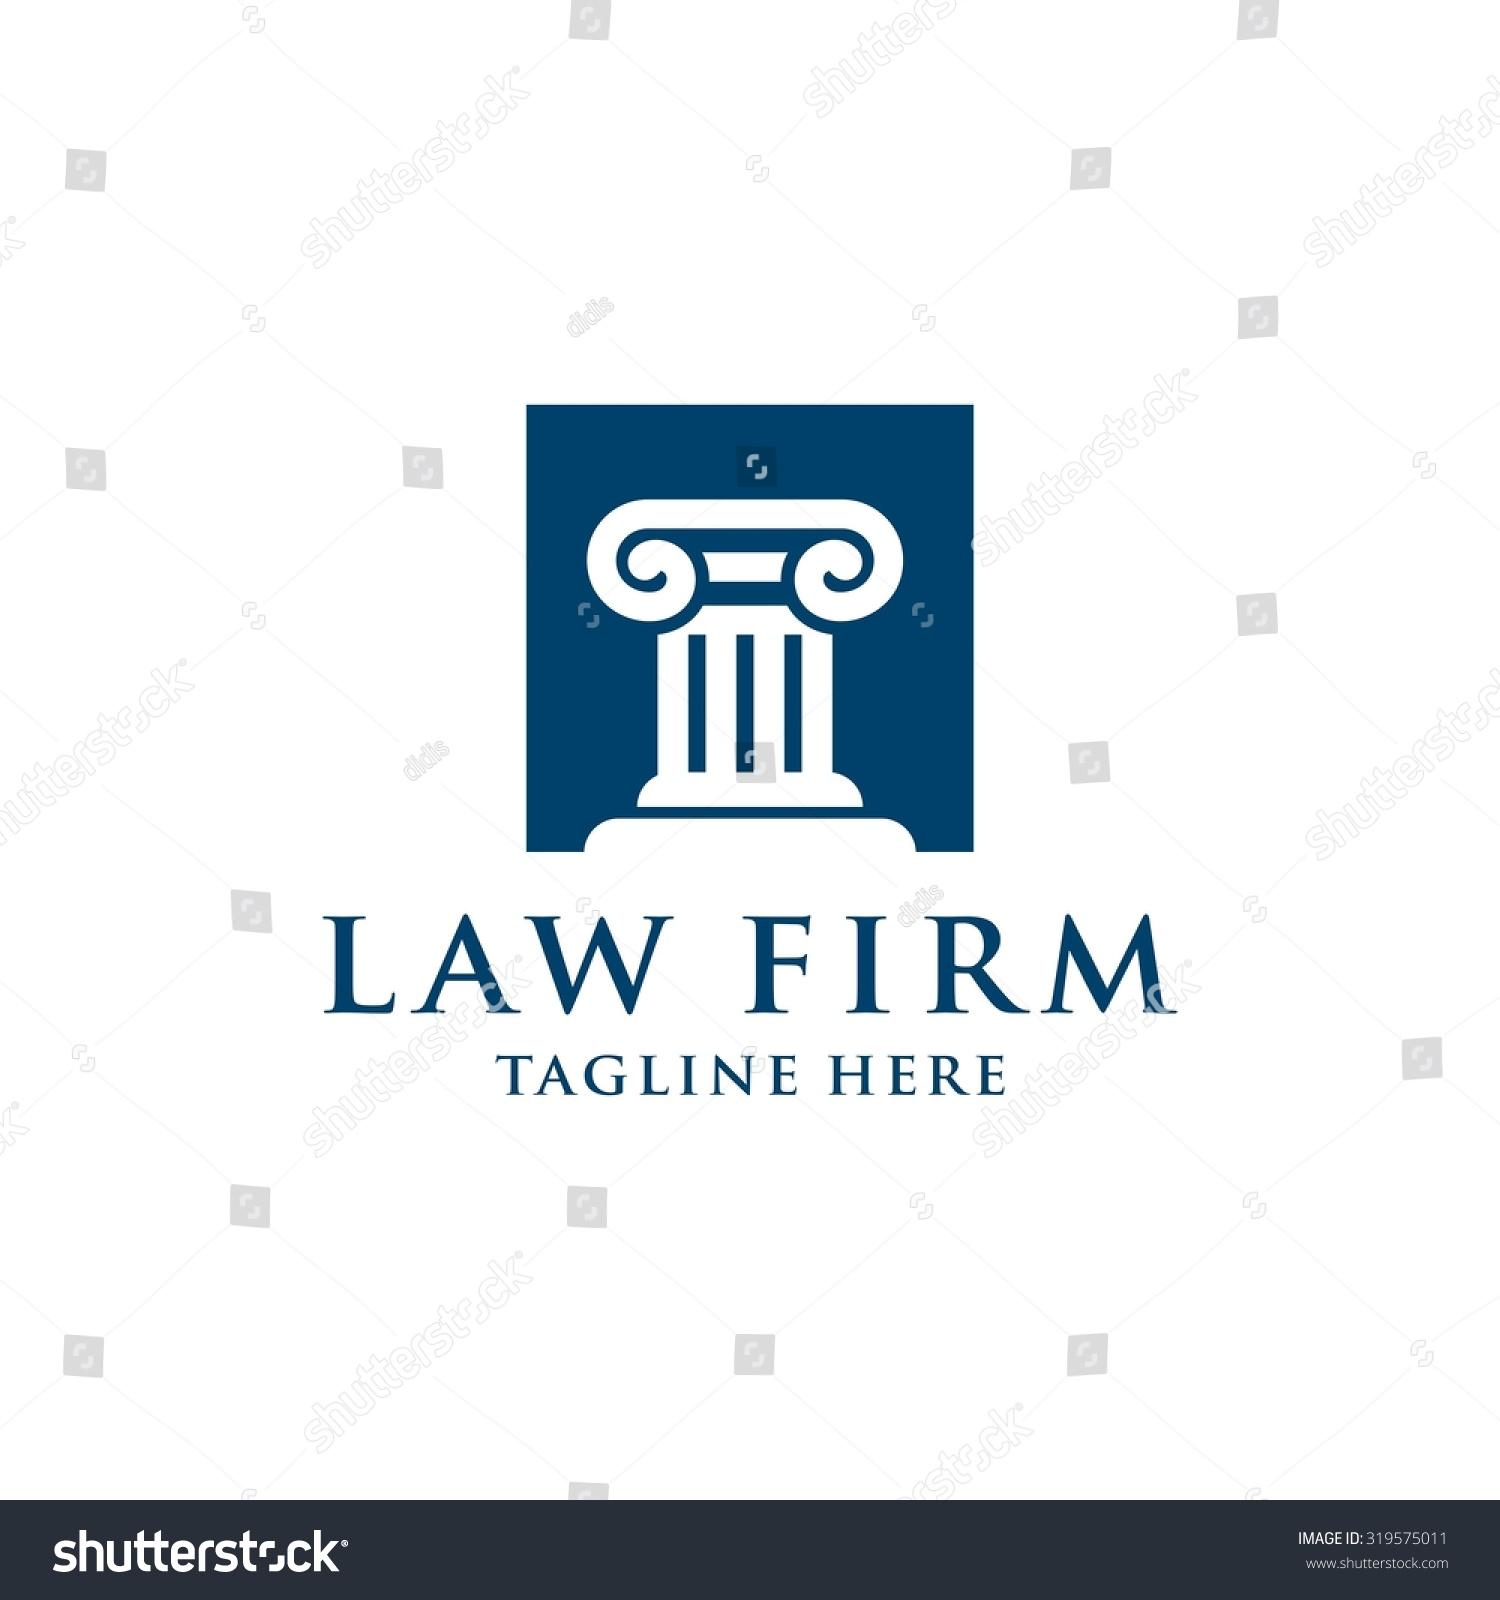 Law Firm Logo Template Stock Vector 319575011 - Shutterstock